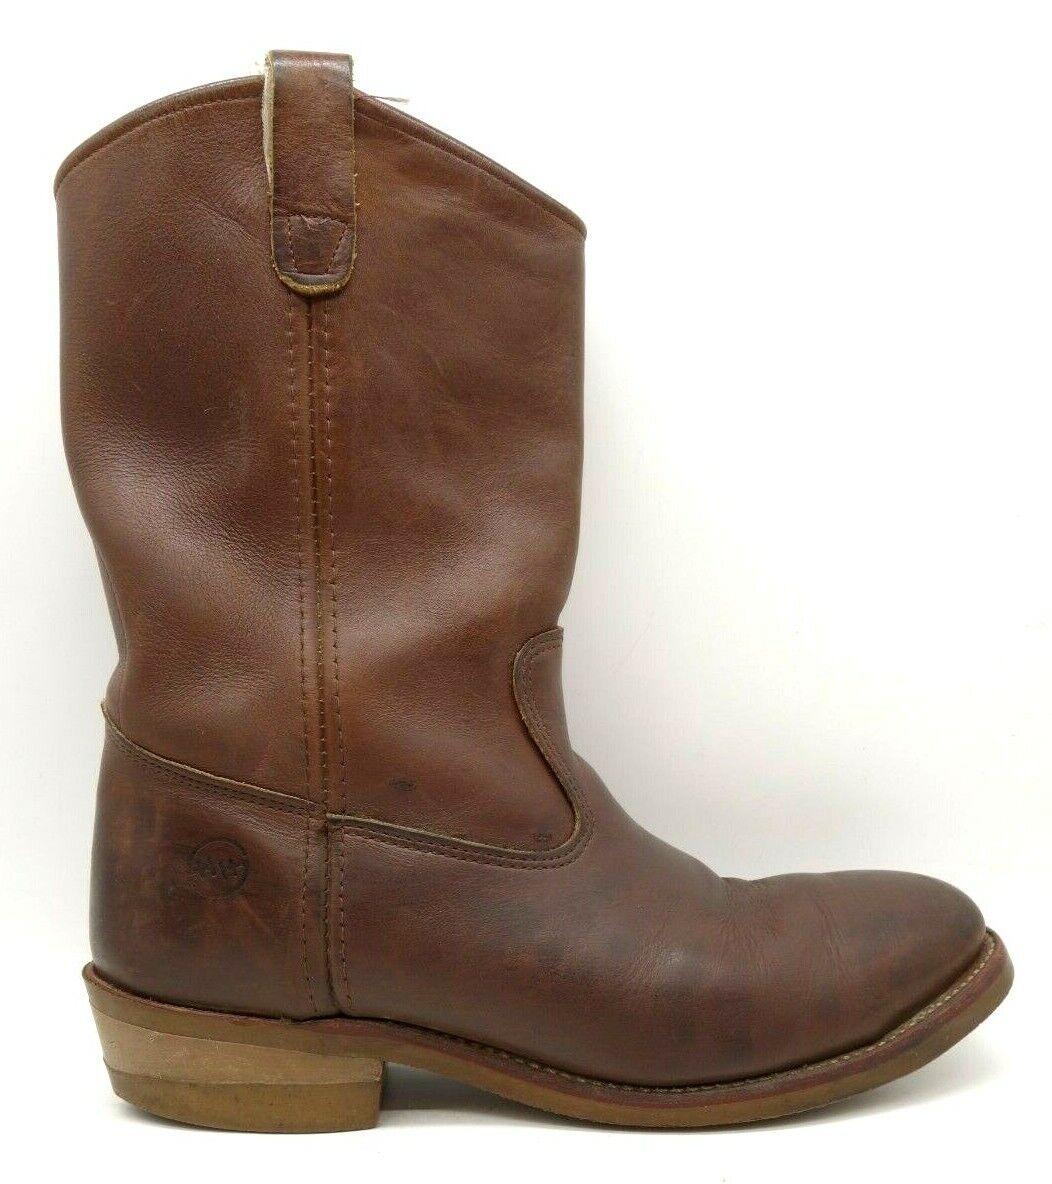 Double H Brown Leather Oil Resistant Classic Cowboy Western Boots Men's 10 D